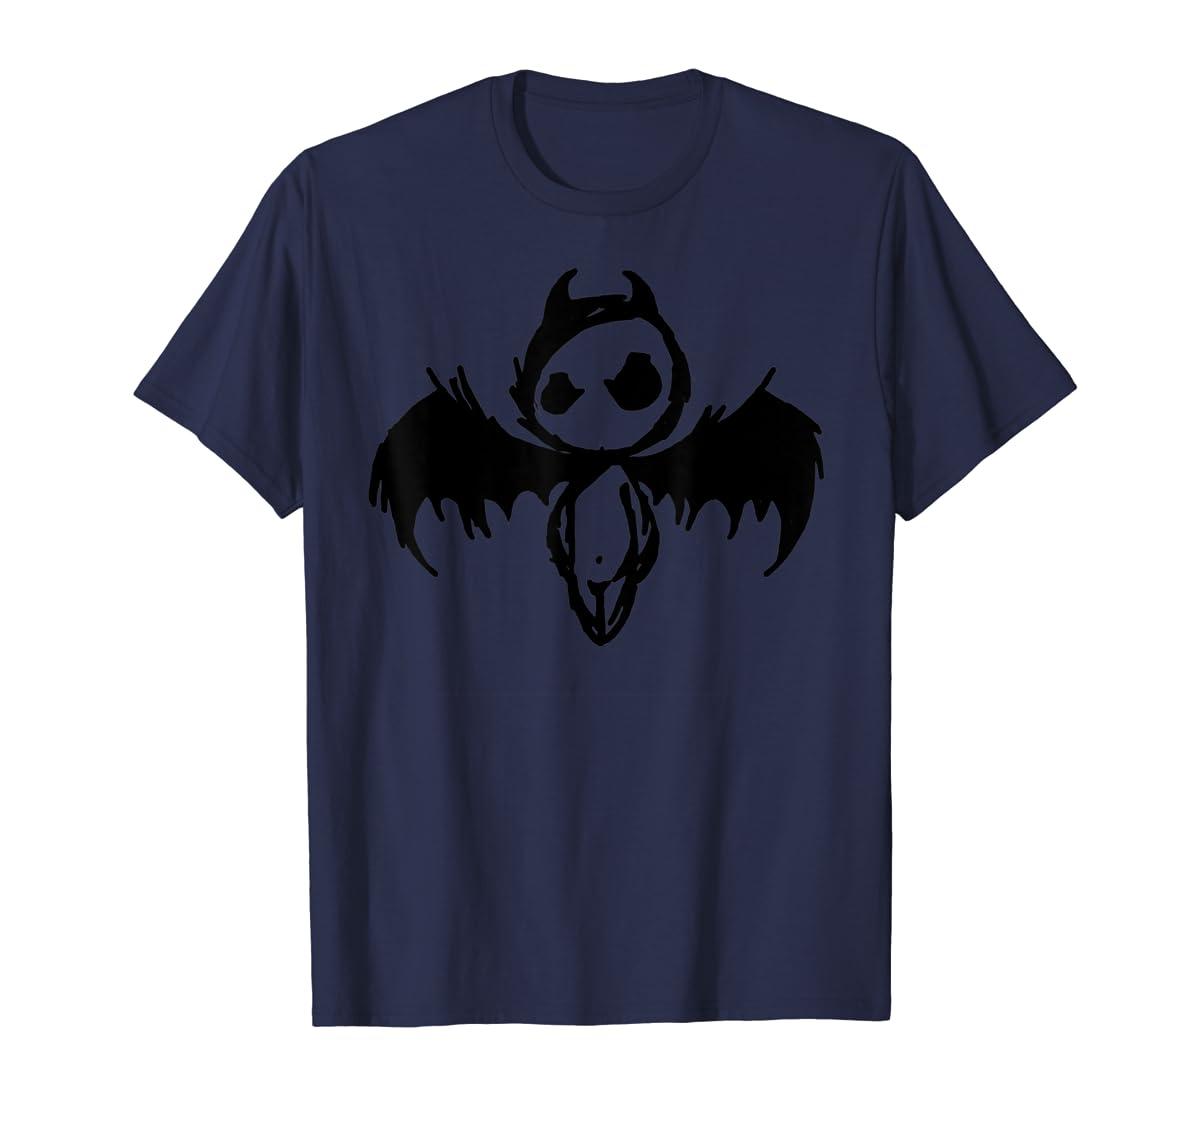 Cute Demon Vintage Couple Matching Halloween Party Costume  T-Shirt-Men's T-Shirt-Navy